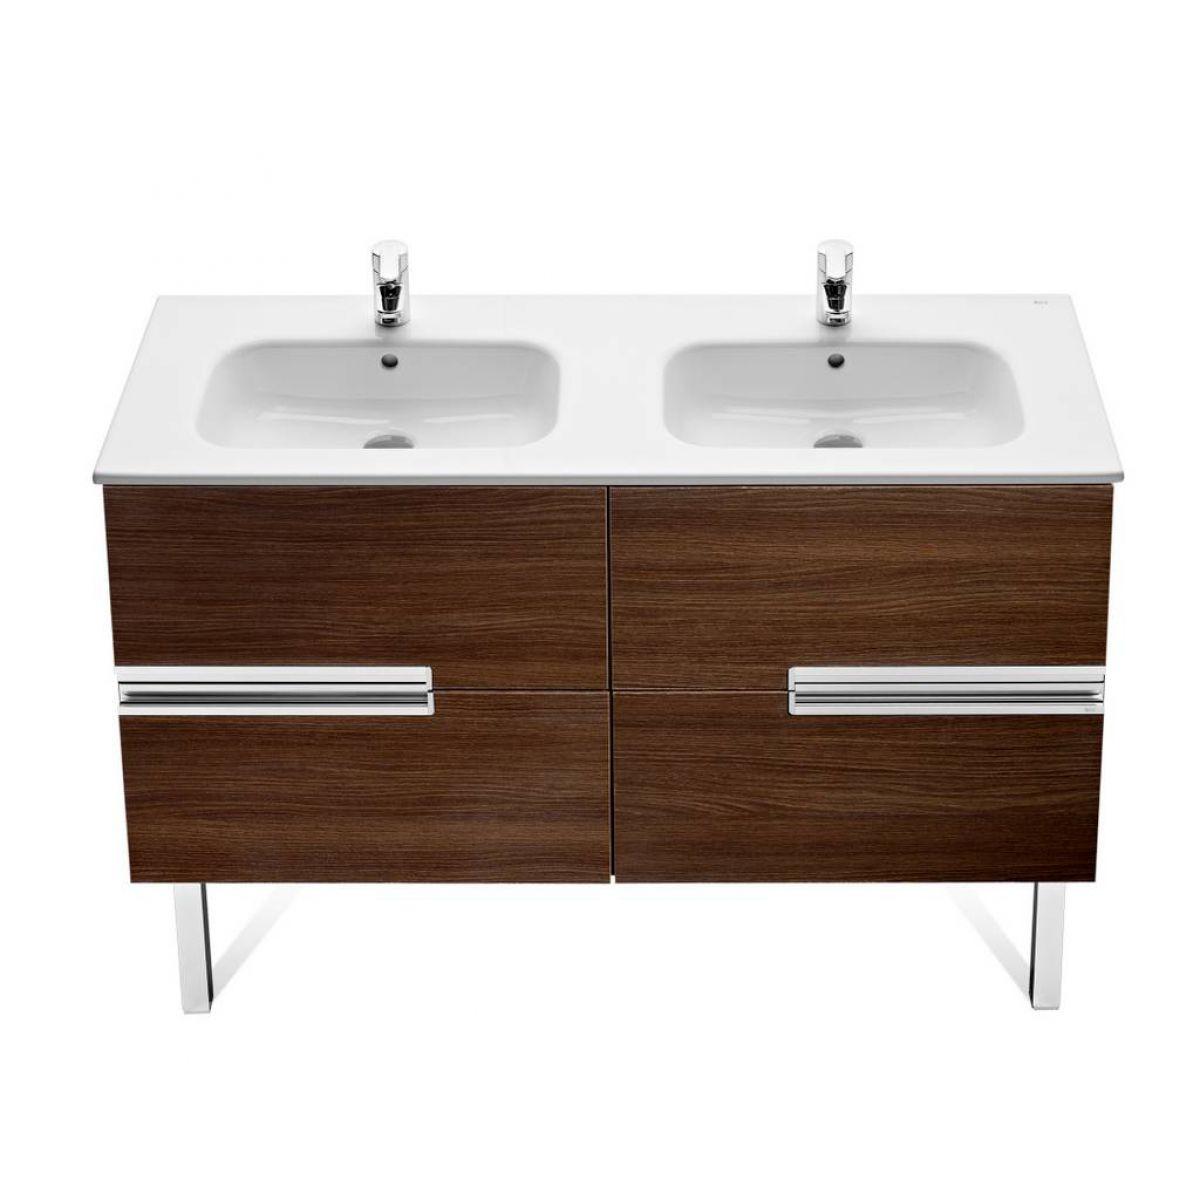 Bathroom units uk - Roca Victoria N Double Drawer Double Vanity Unit